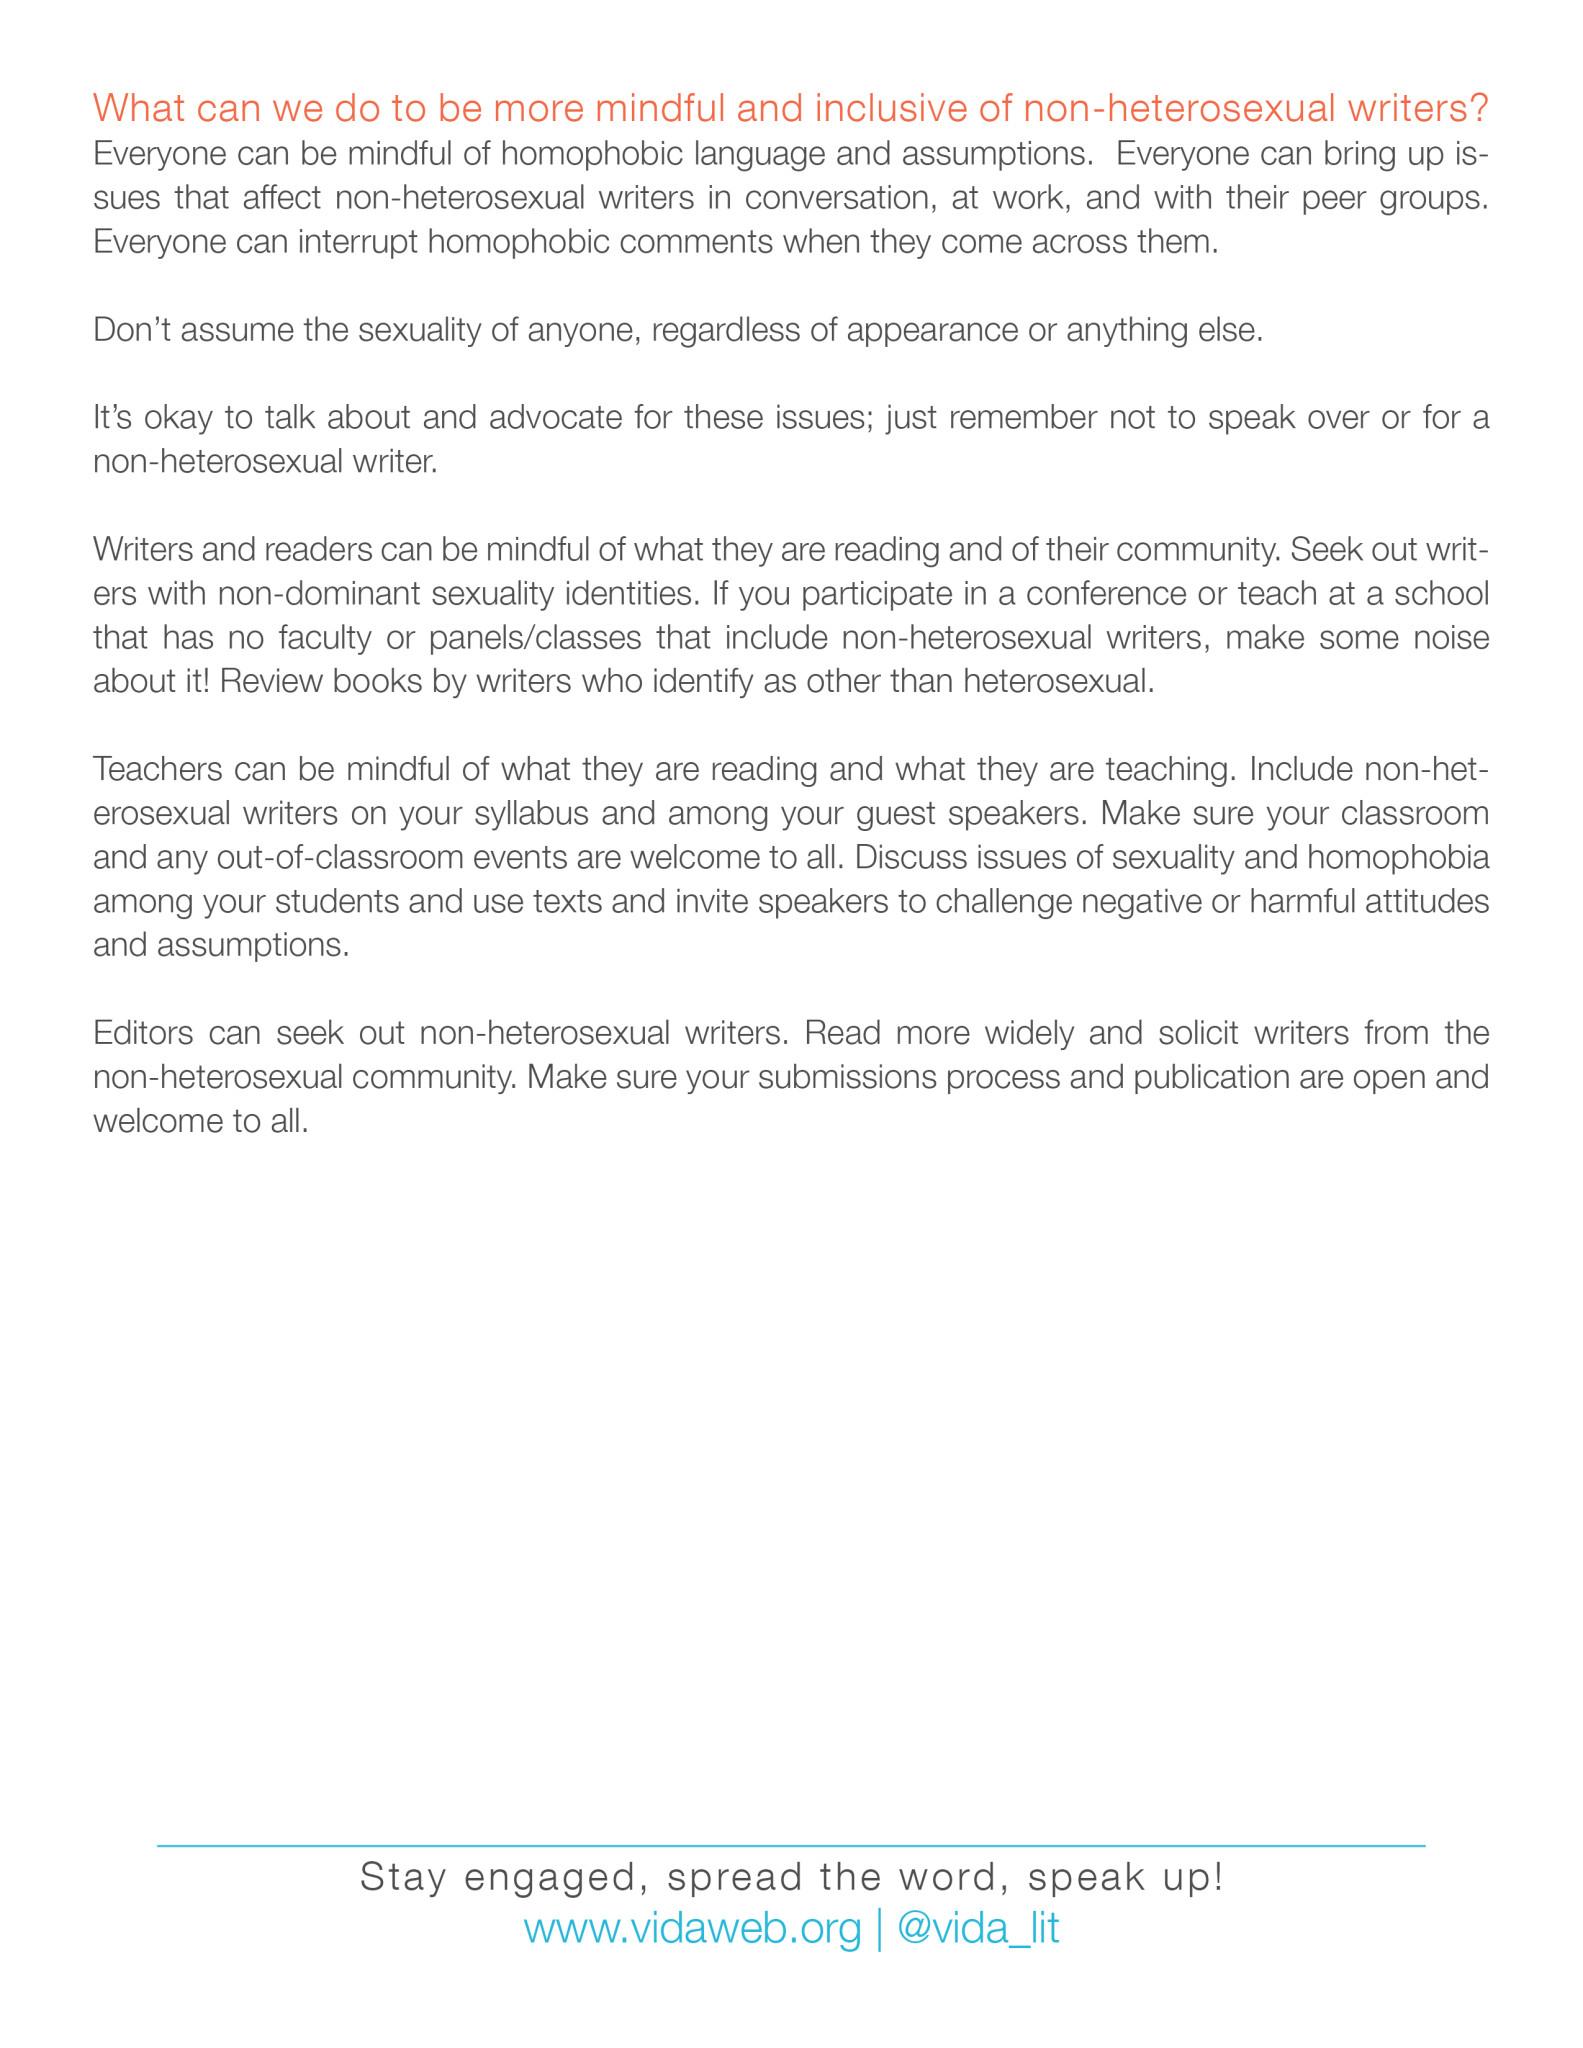 VIDA Sexuality Primer: page 2